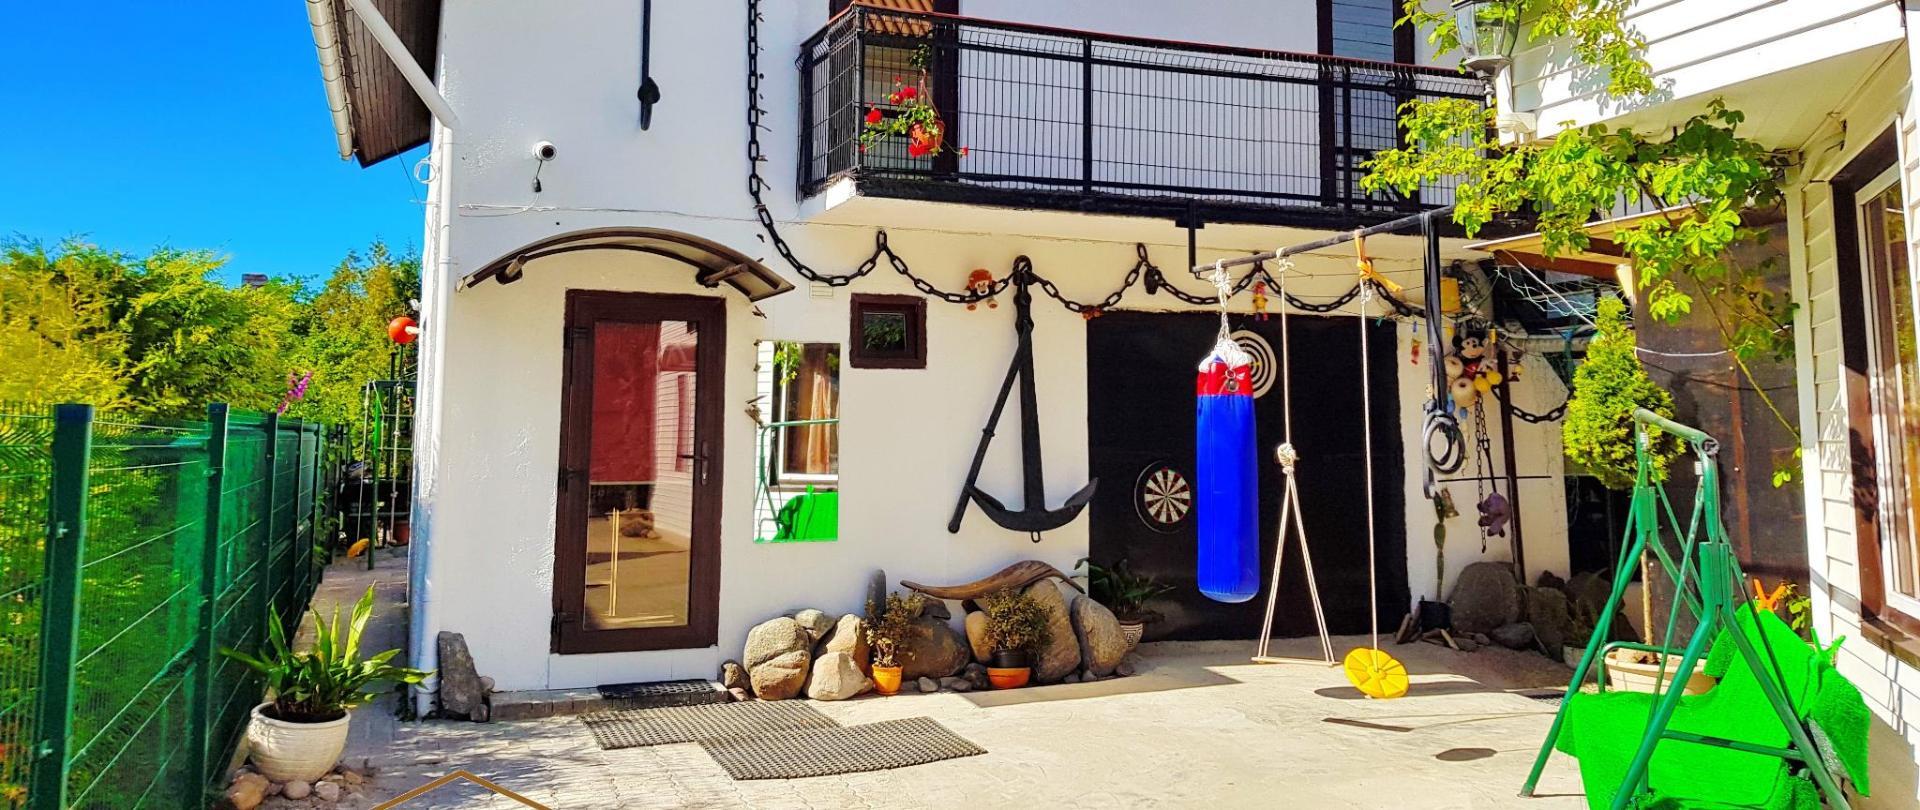 bb Rest House Inkaras rooms for rent.jpg